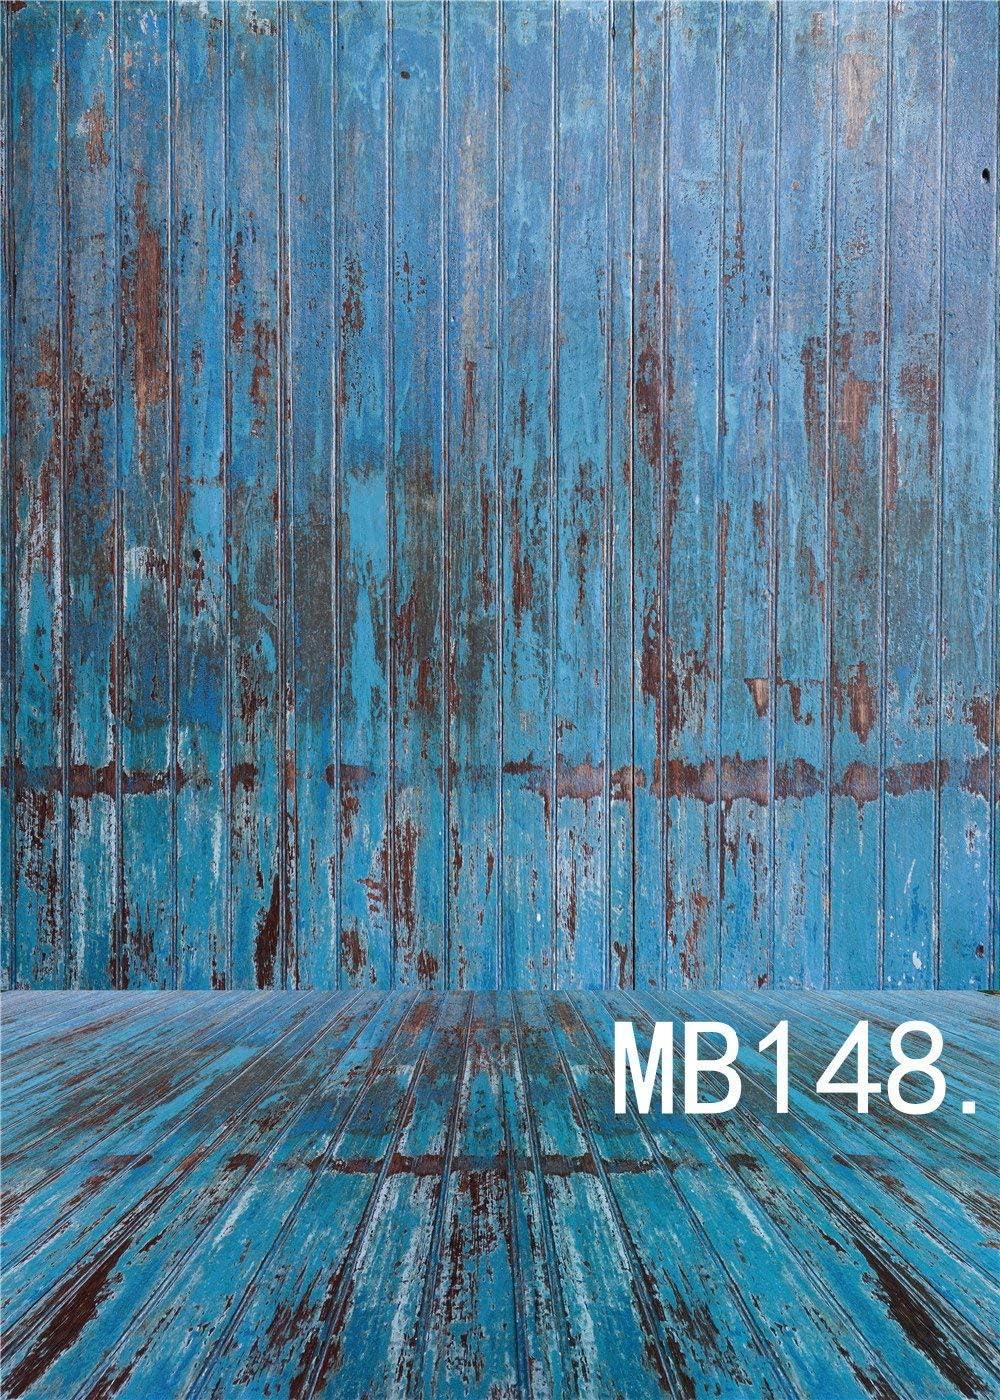 LB 5x7ft Vinyl Photography Backdrop Retro Deciduous Faded Wooden Floor Wall Backdrop Blue Customized Photo Background Studio Prop MB148